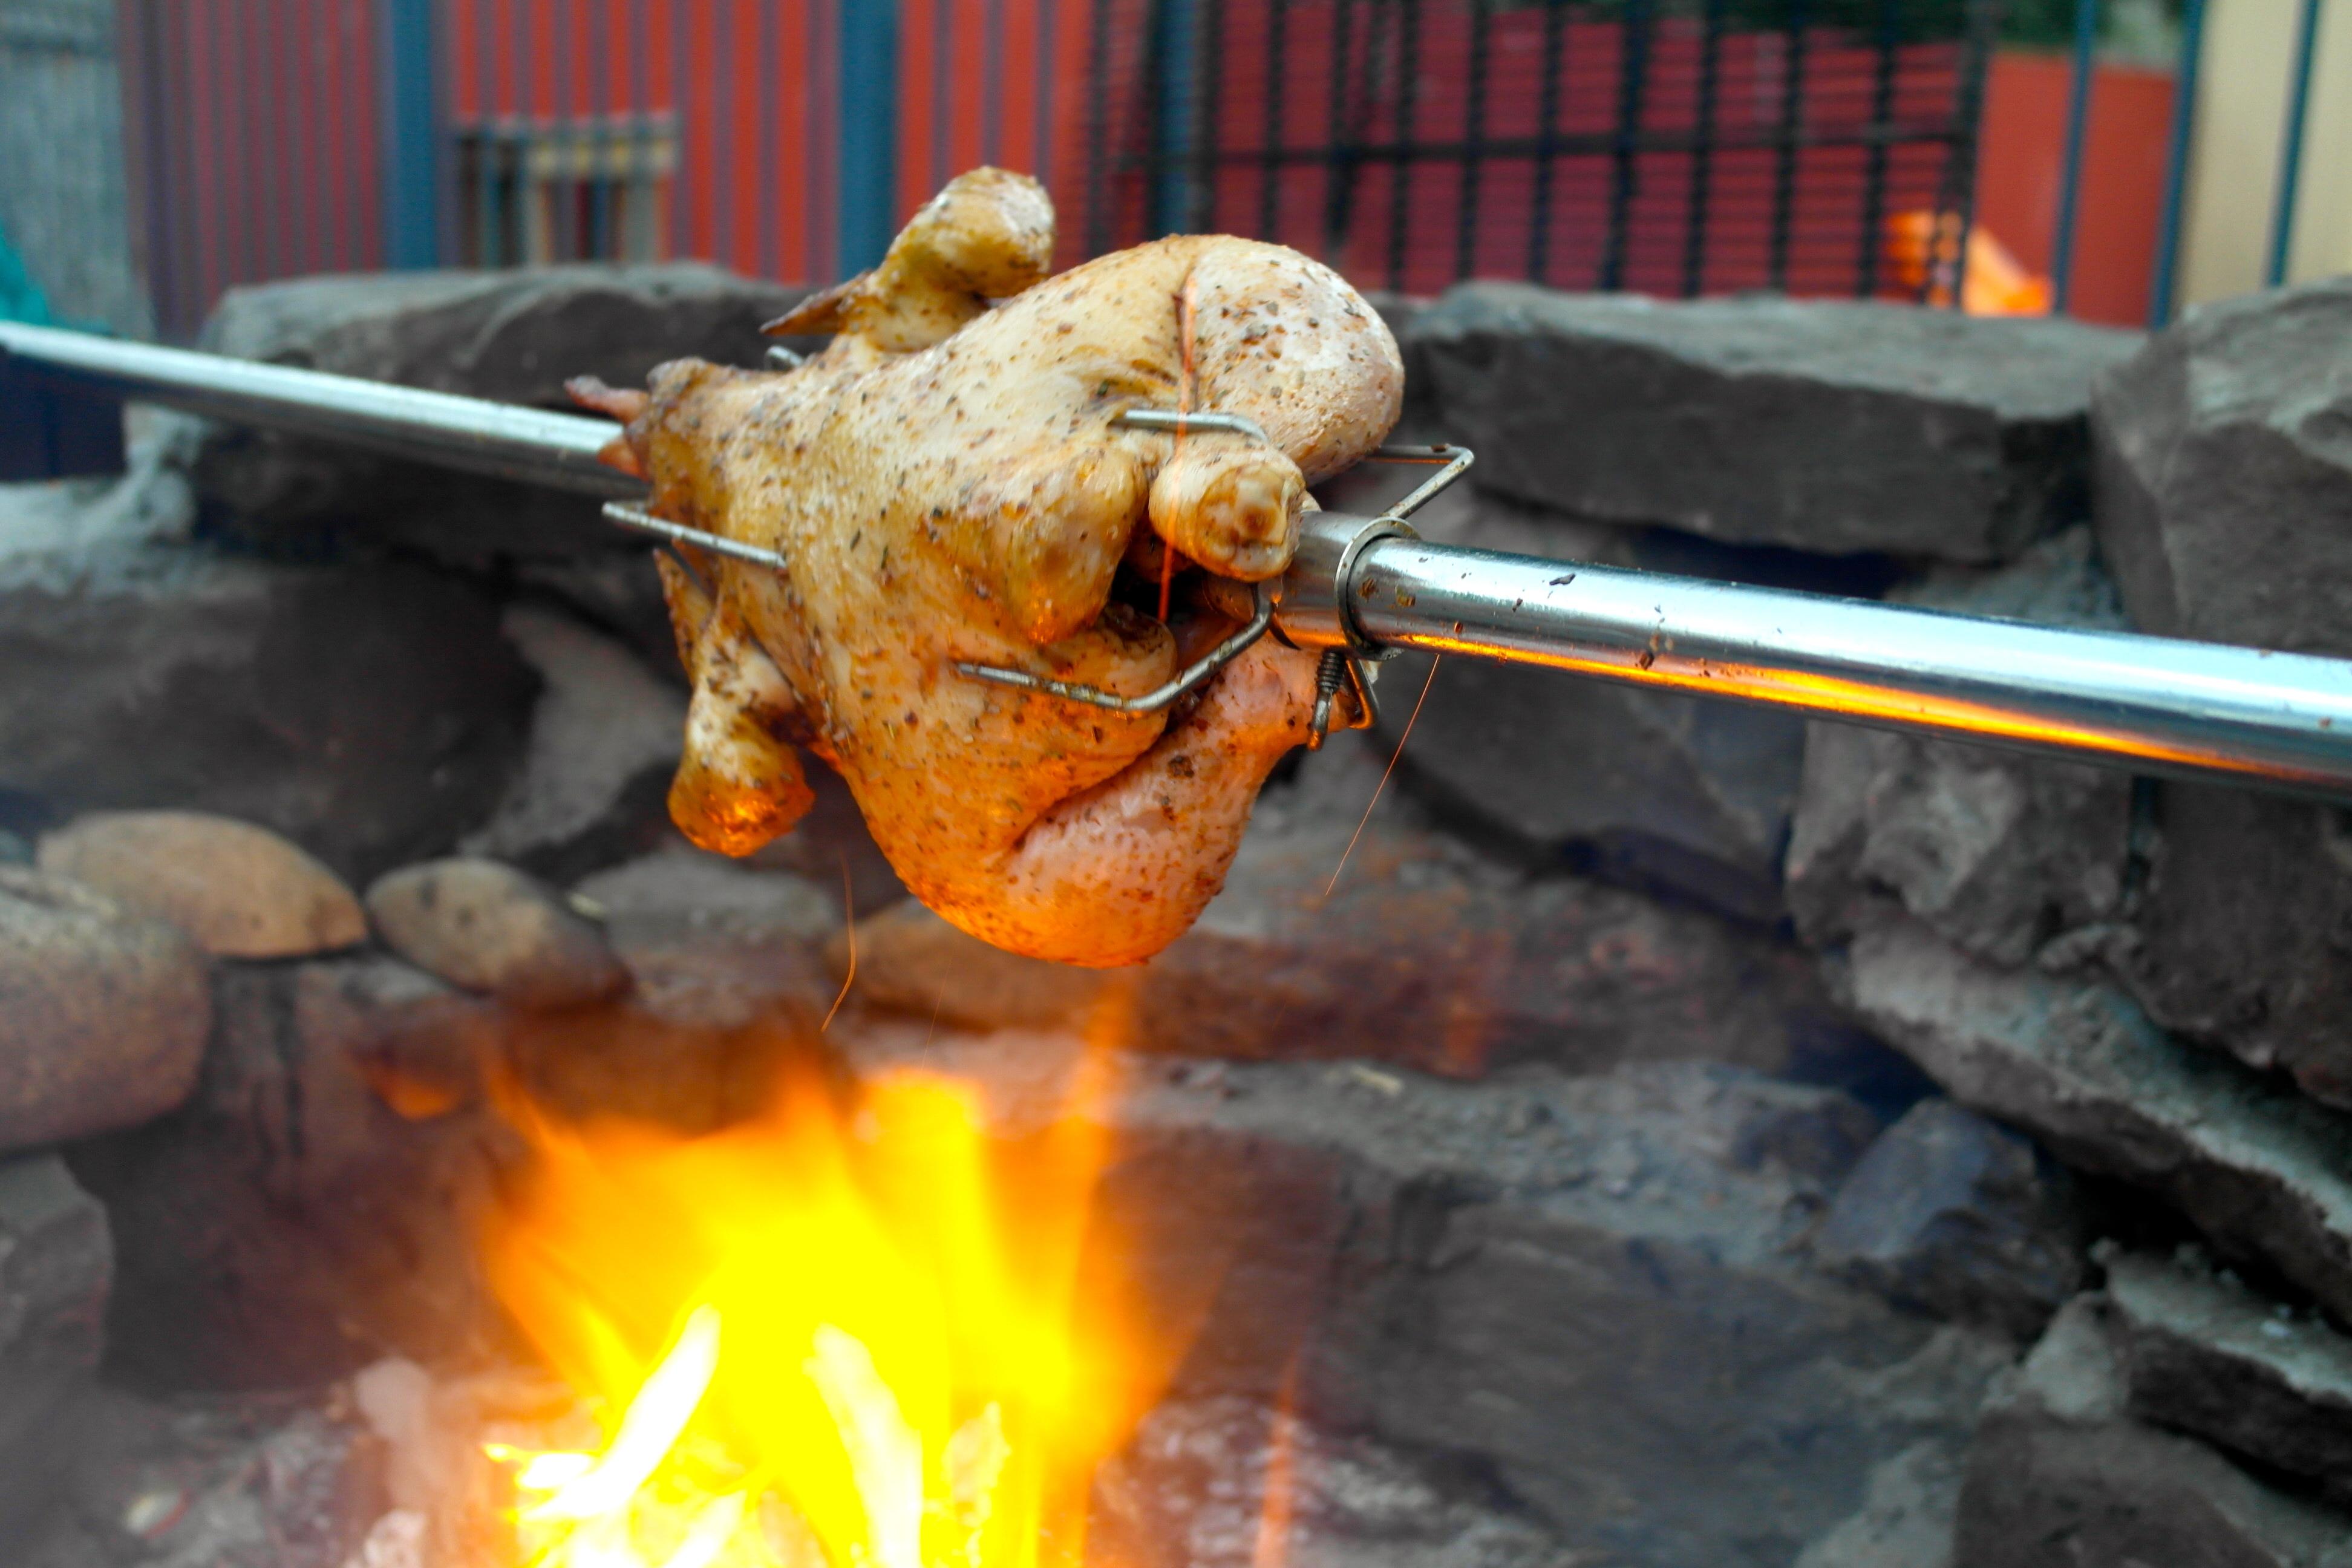 Roast chicken on the f...